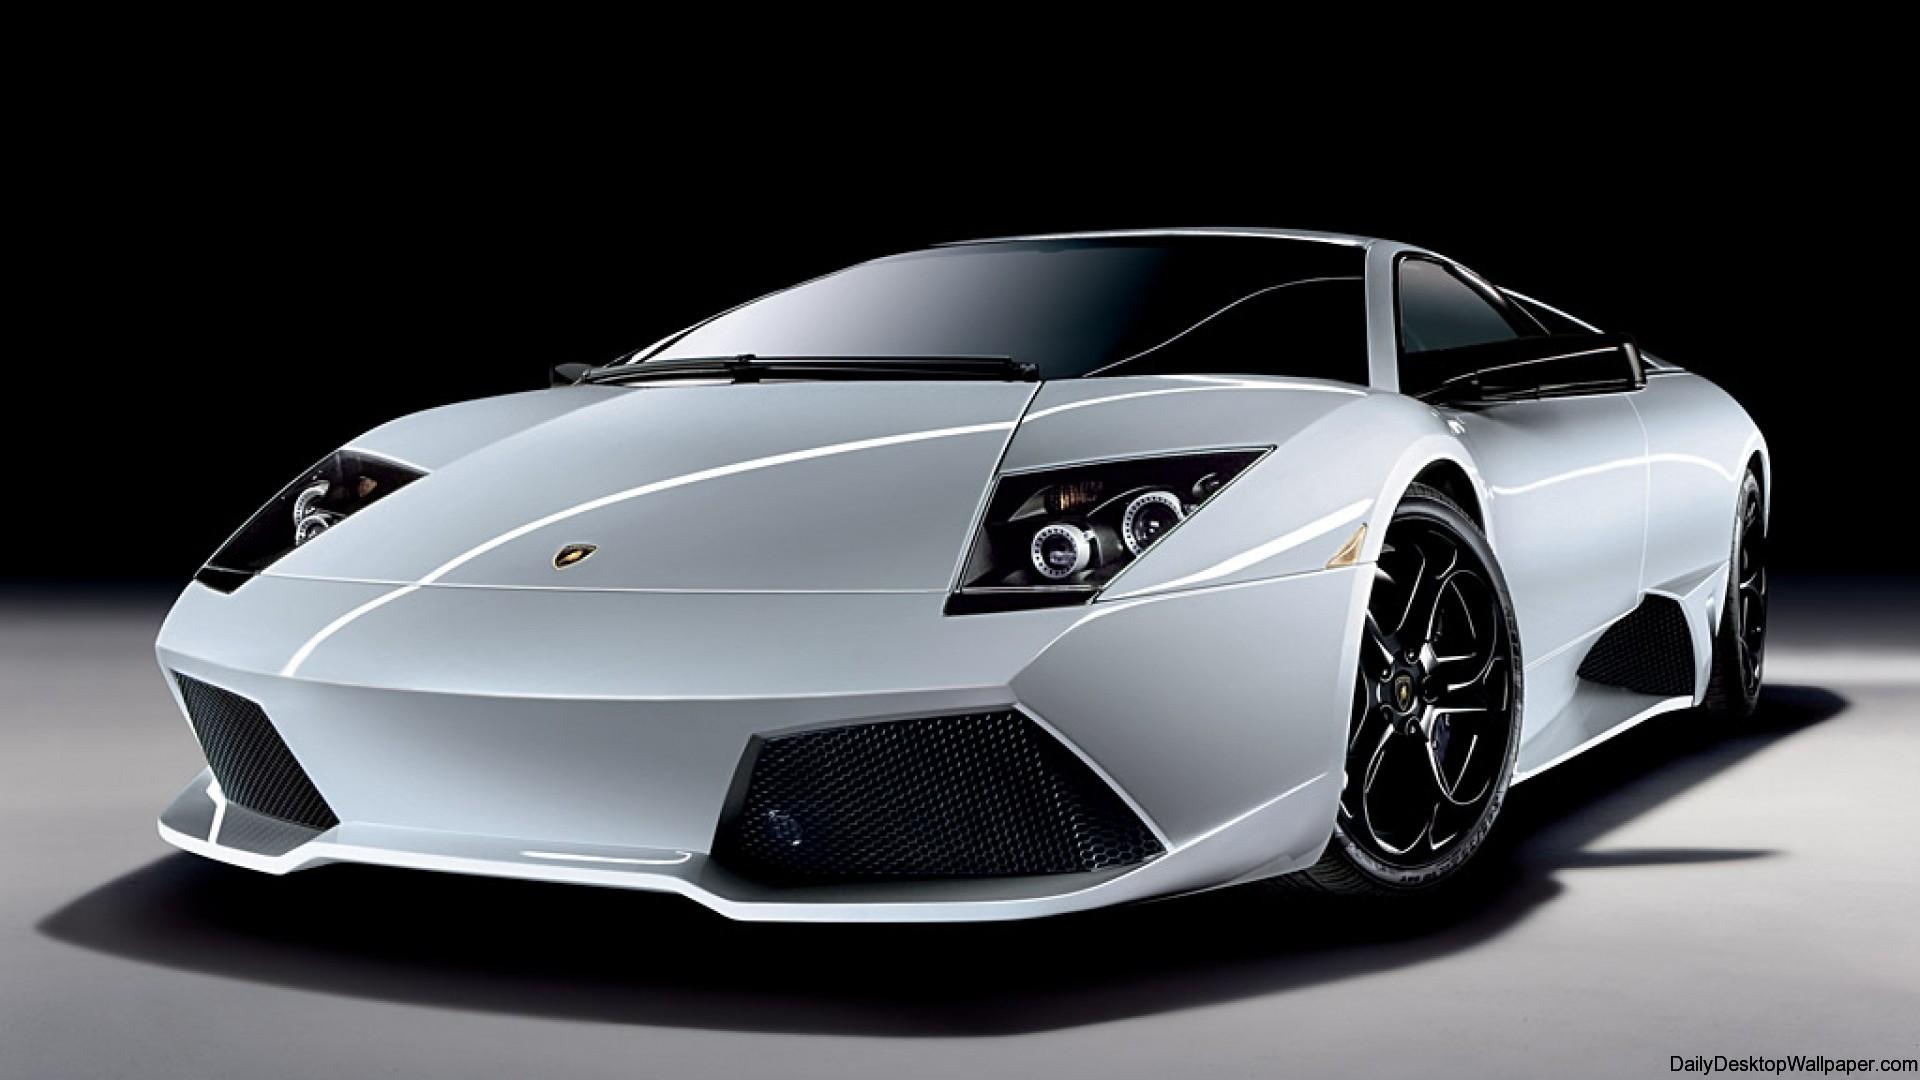 Lamborghini LP640 Wallpaper